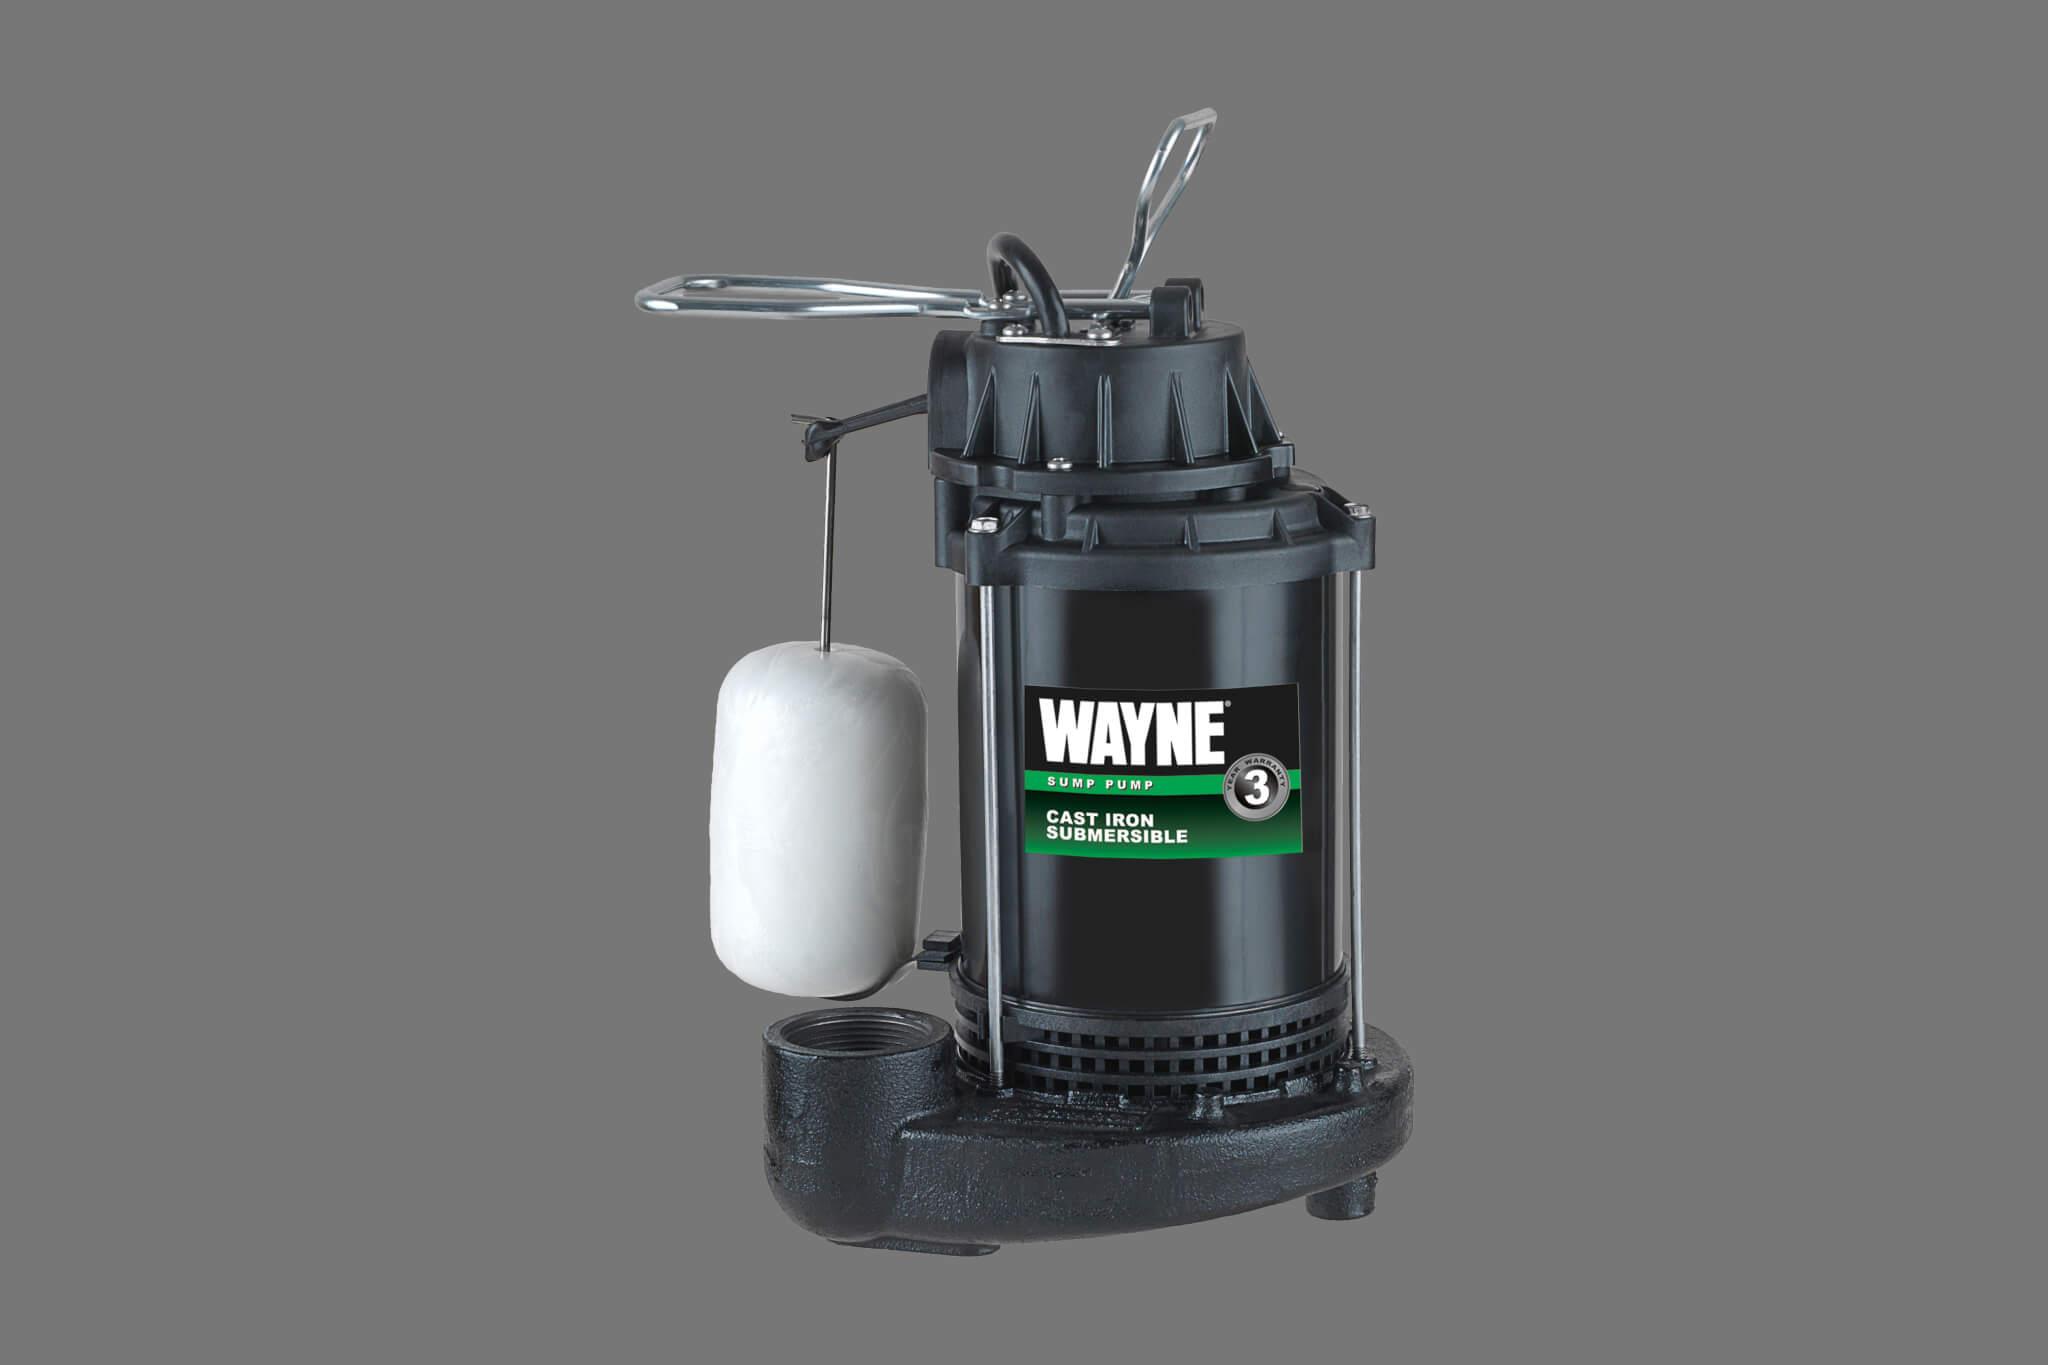 Sump Pump Systems : Wayne submersible hp sump pump system cdu diy